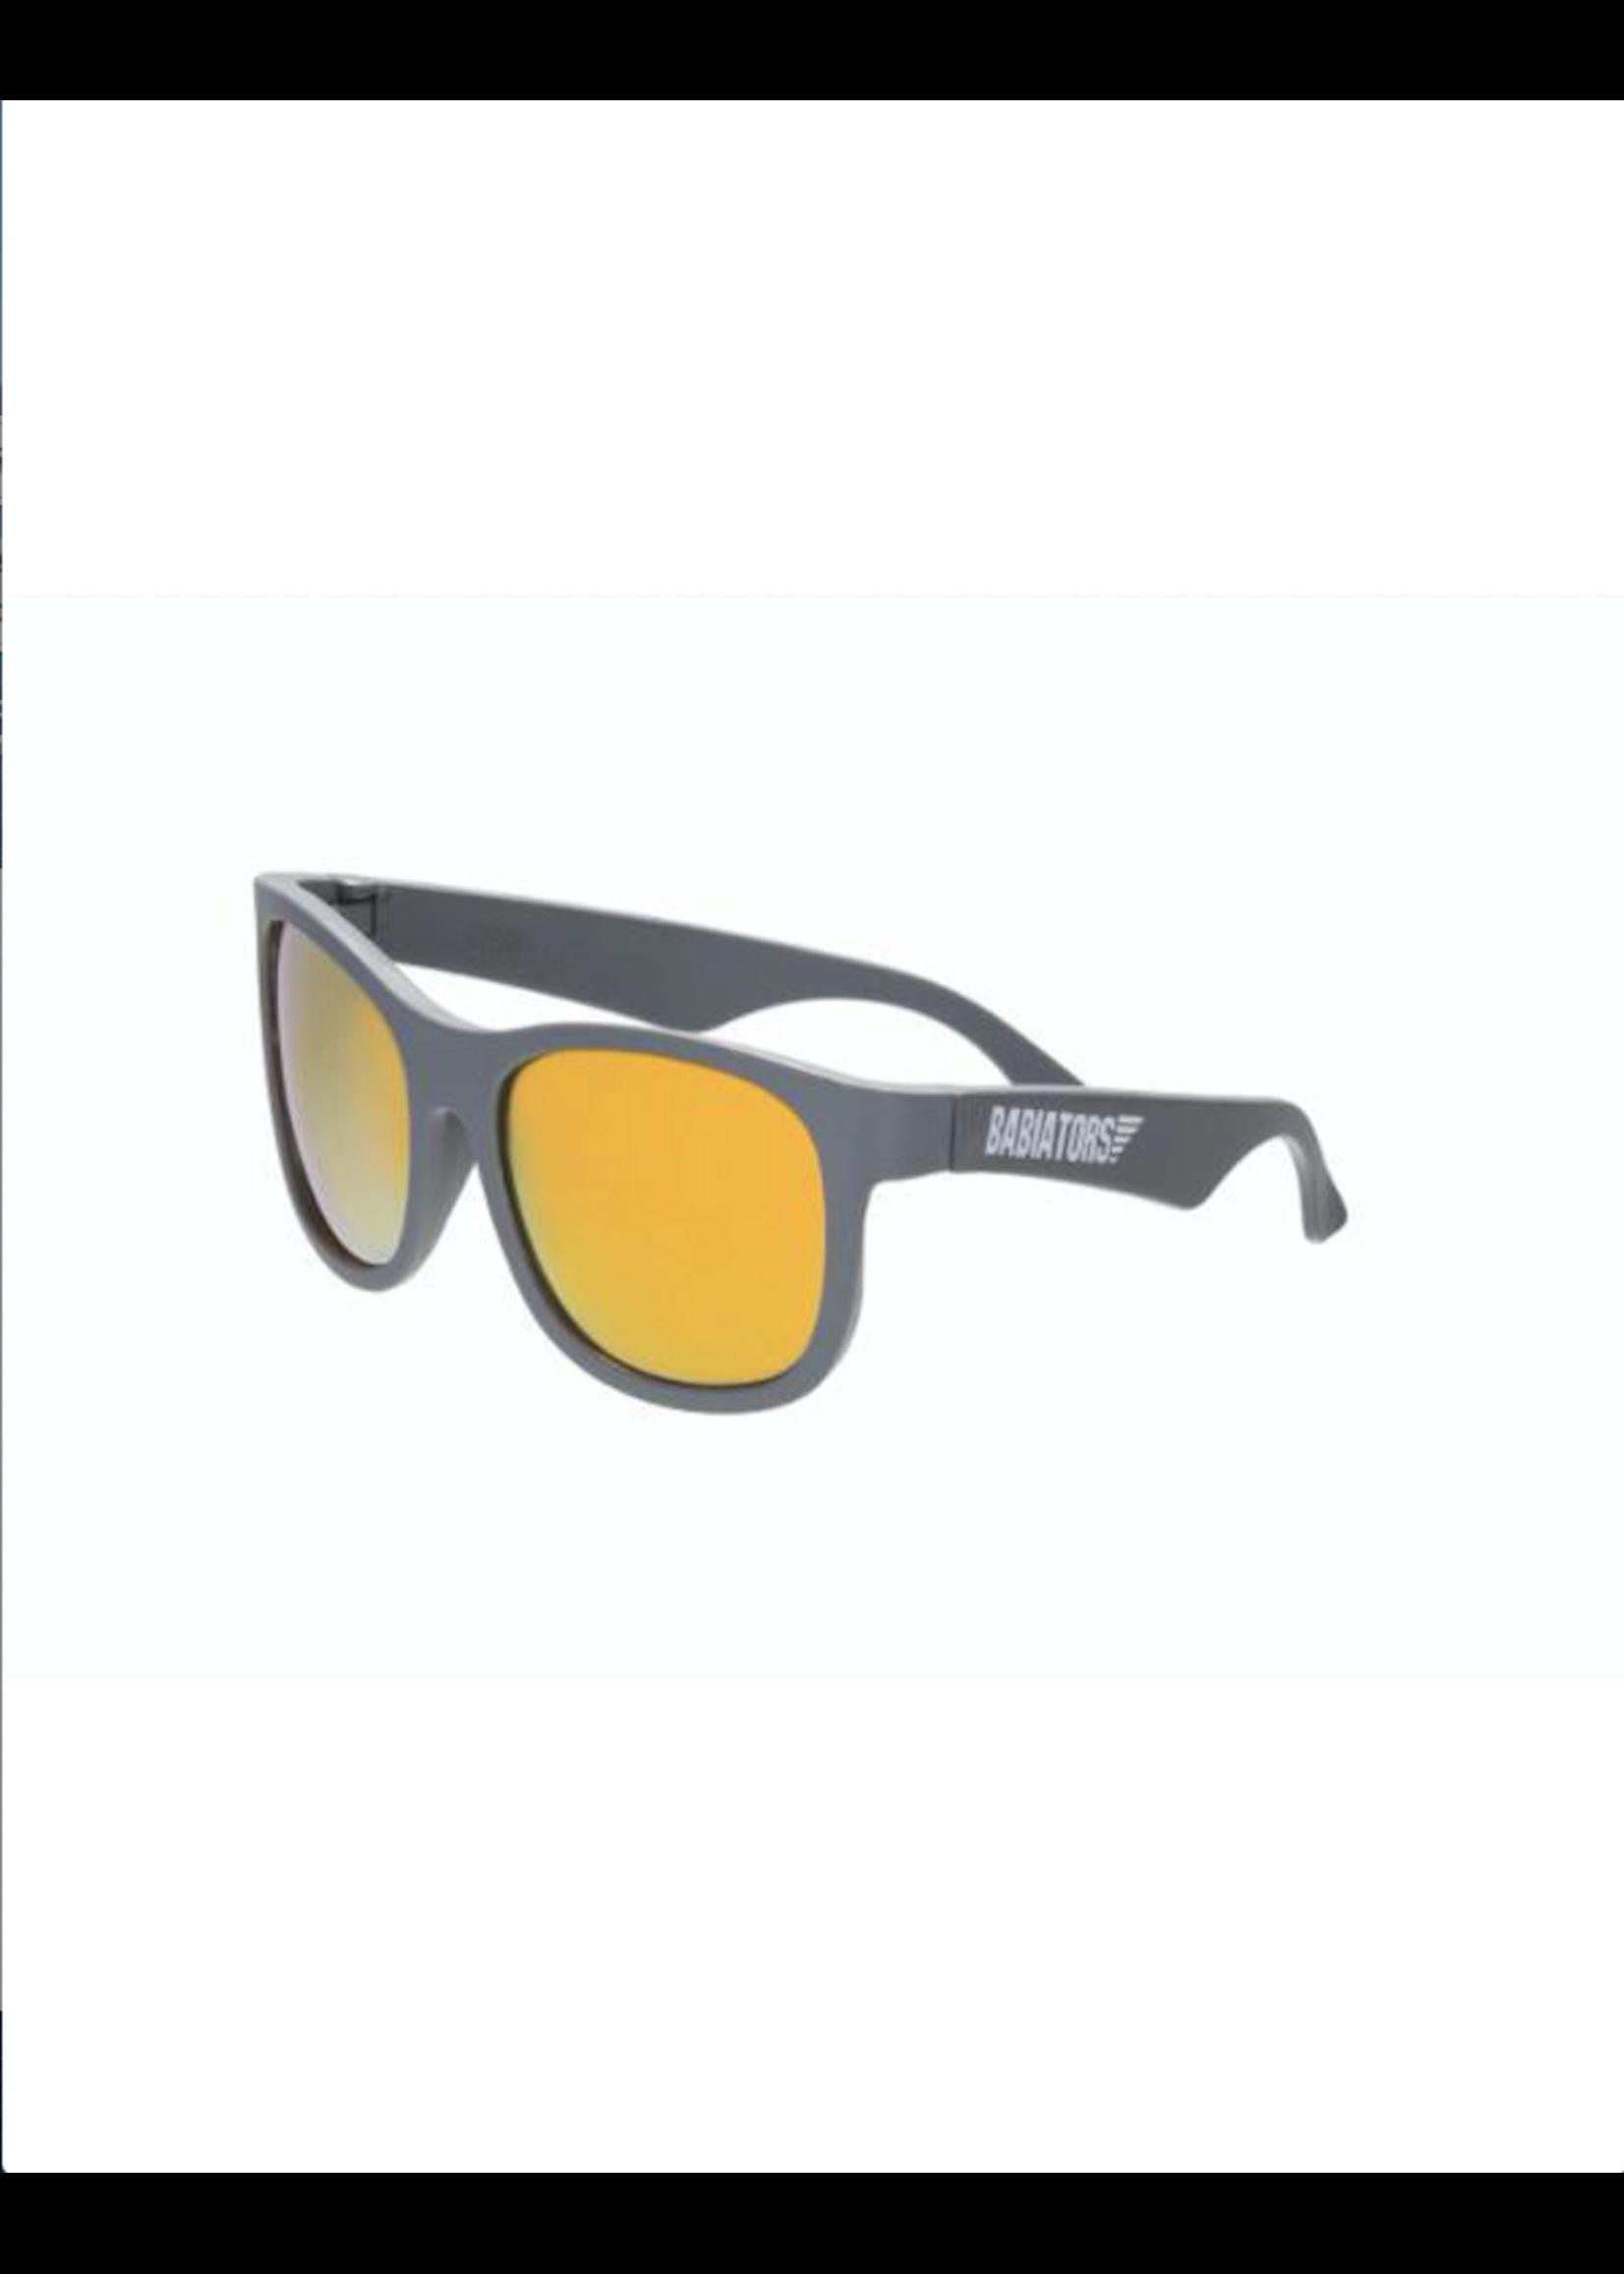 Babiators Babiators, Islander Polarized Sunglasses